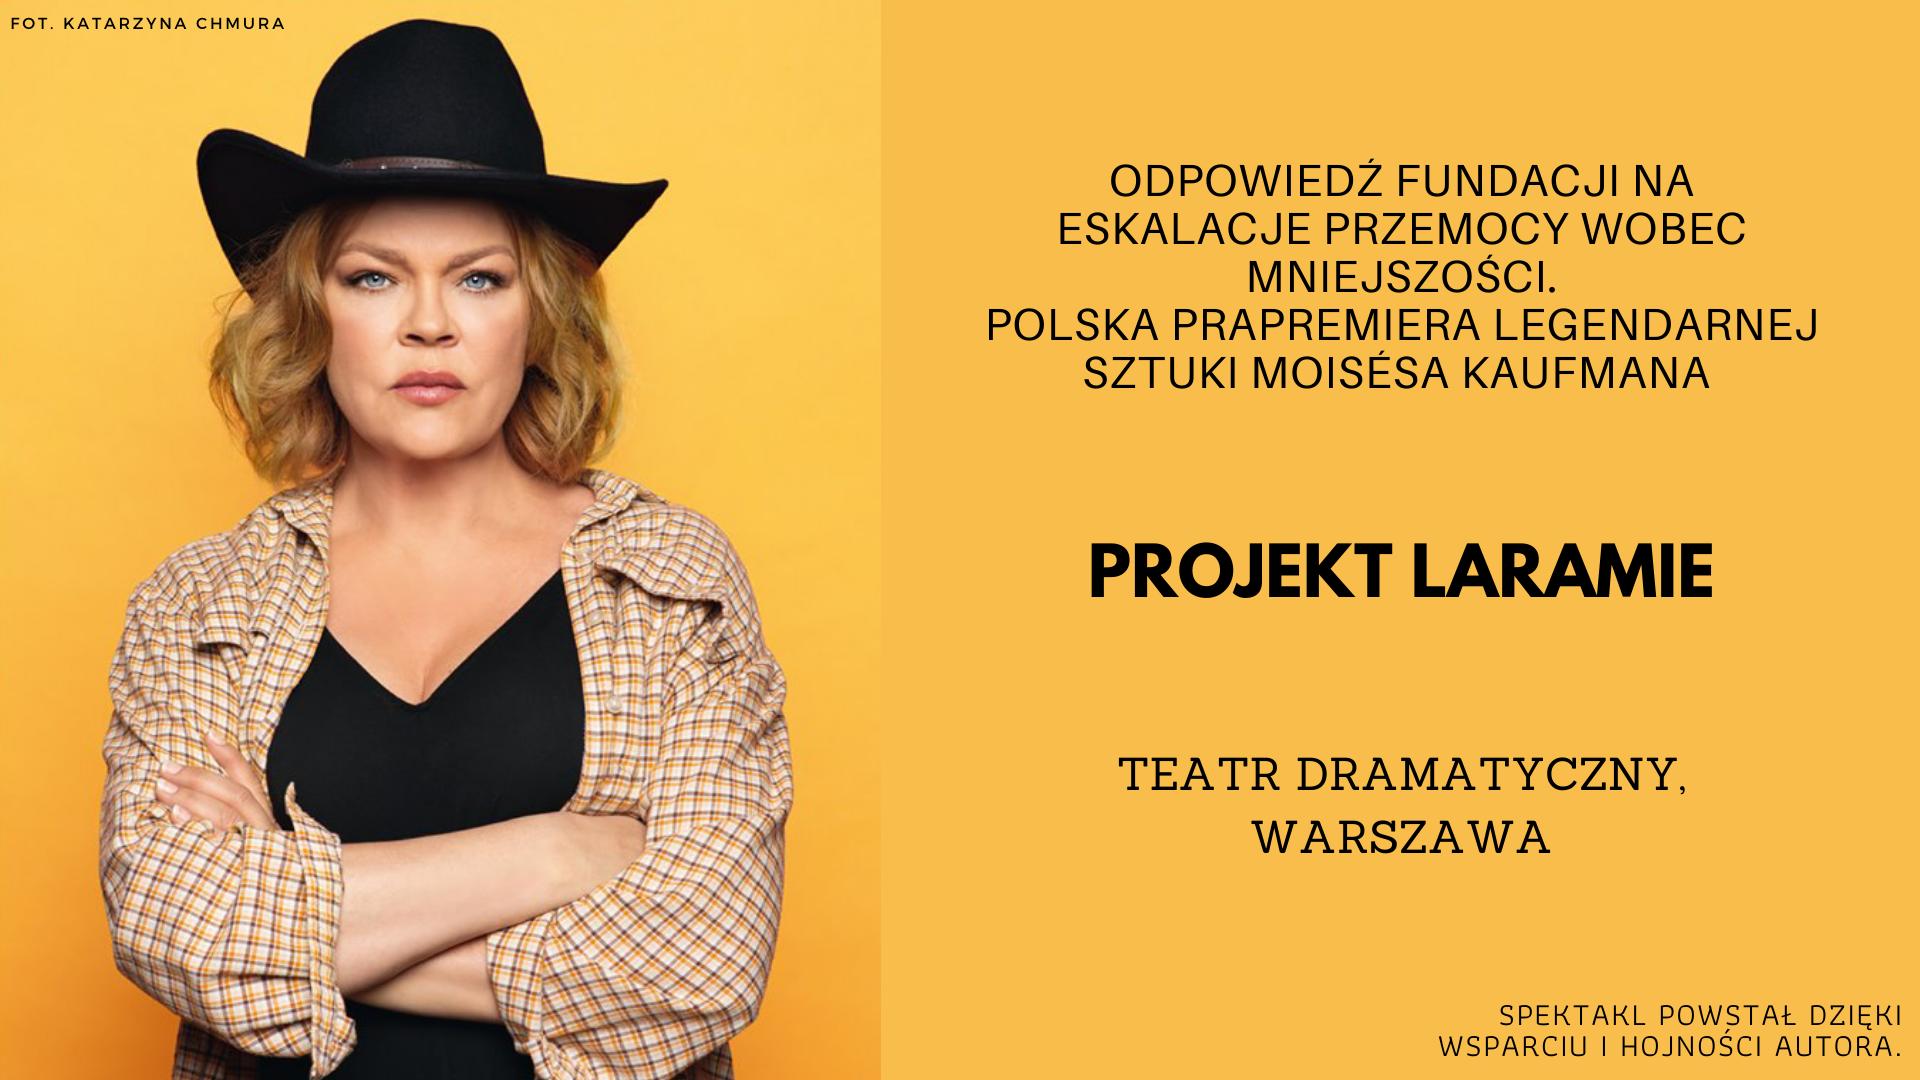 laramie po polsku.png